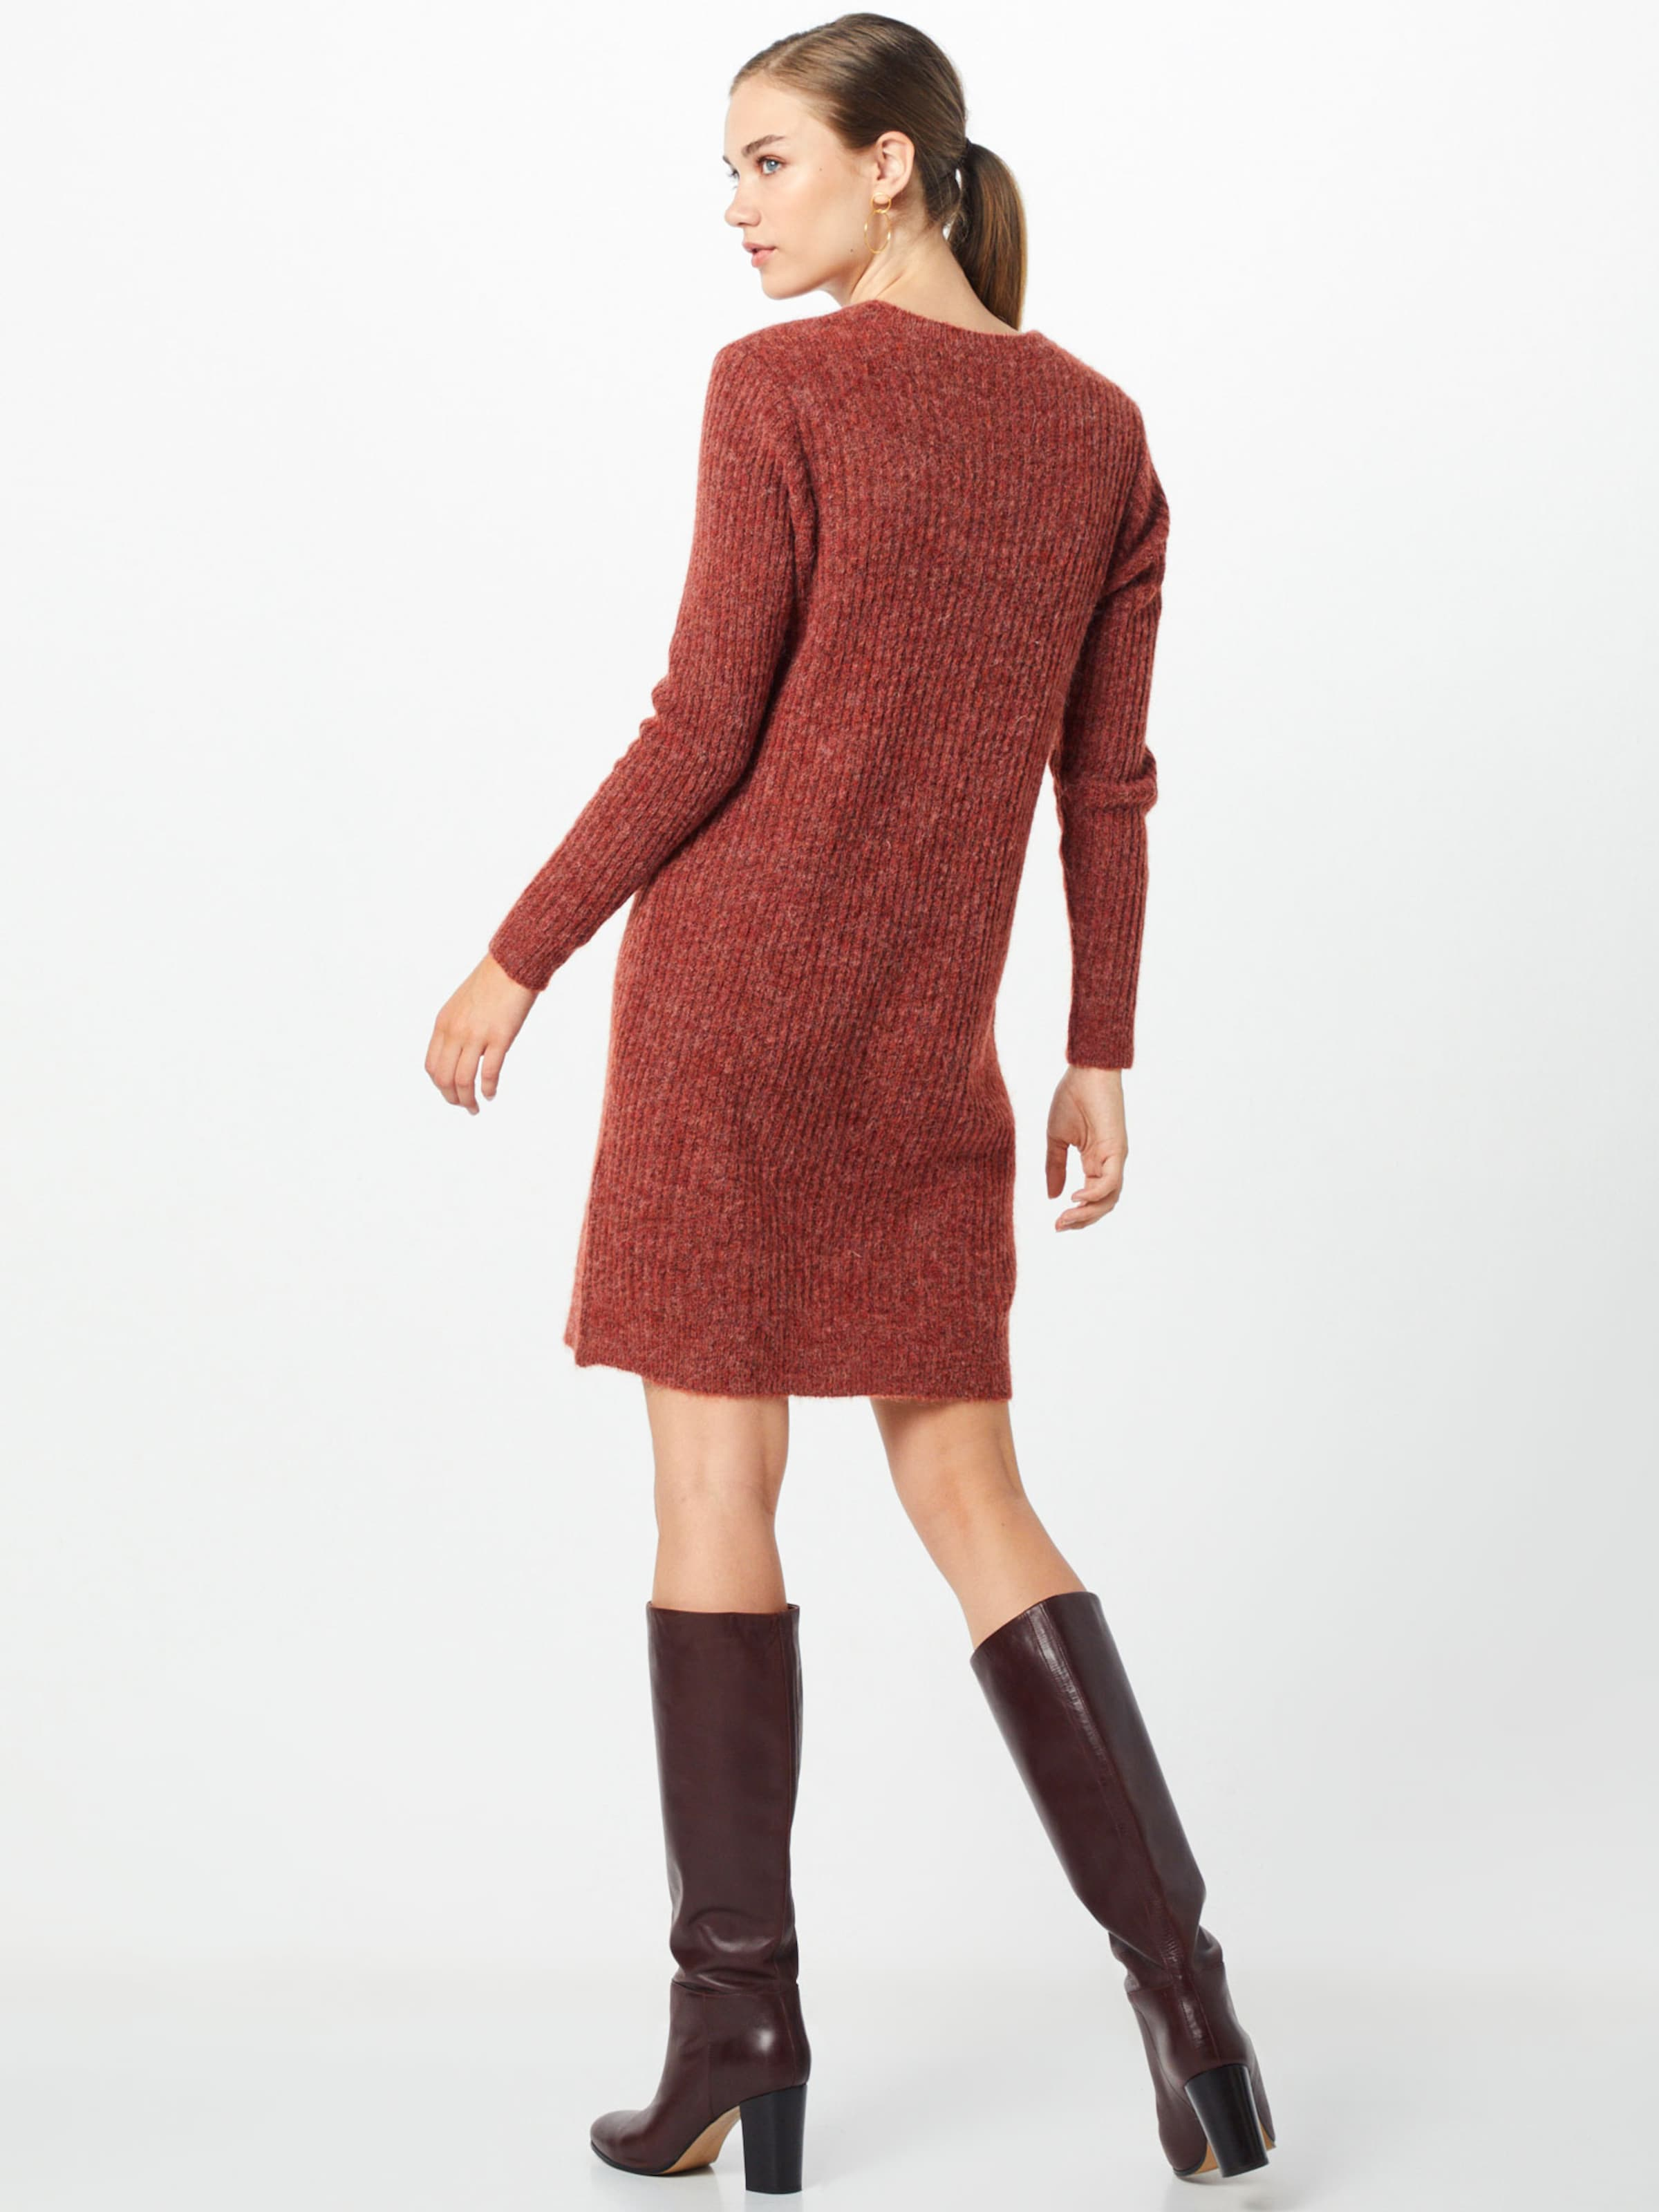 In s L 'vilowsa Knit Rostrot Dress' Vila DamenKleider nOm80vNw